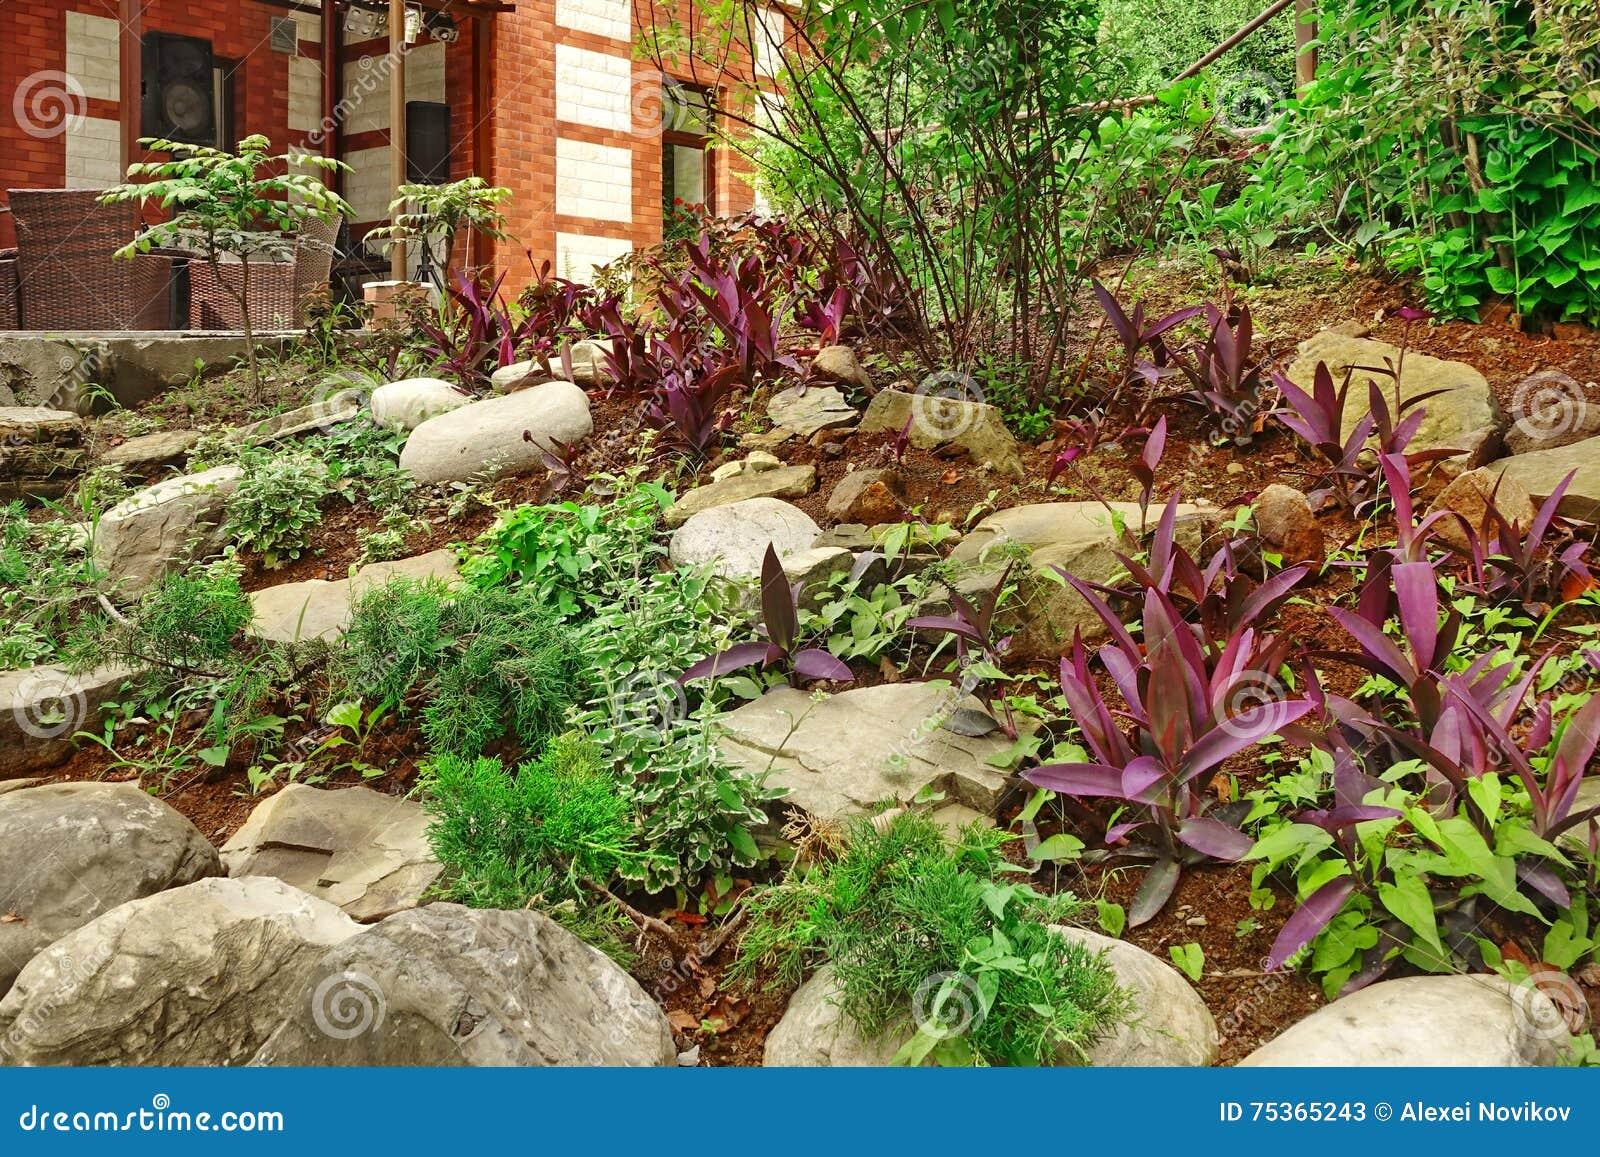 Natural Stone Landscaping. Backyard Decorative Garden. House Ter ...